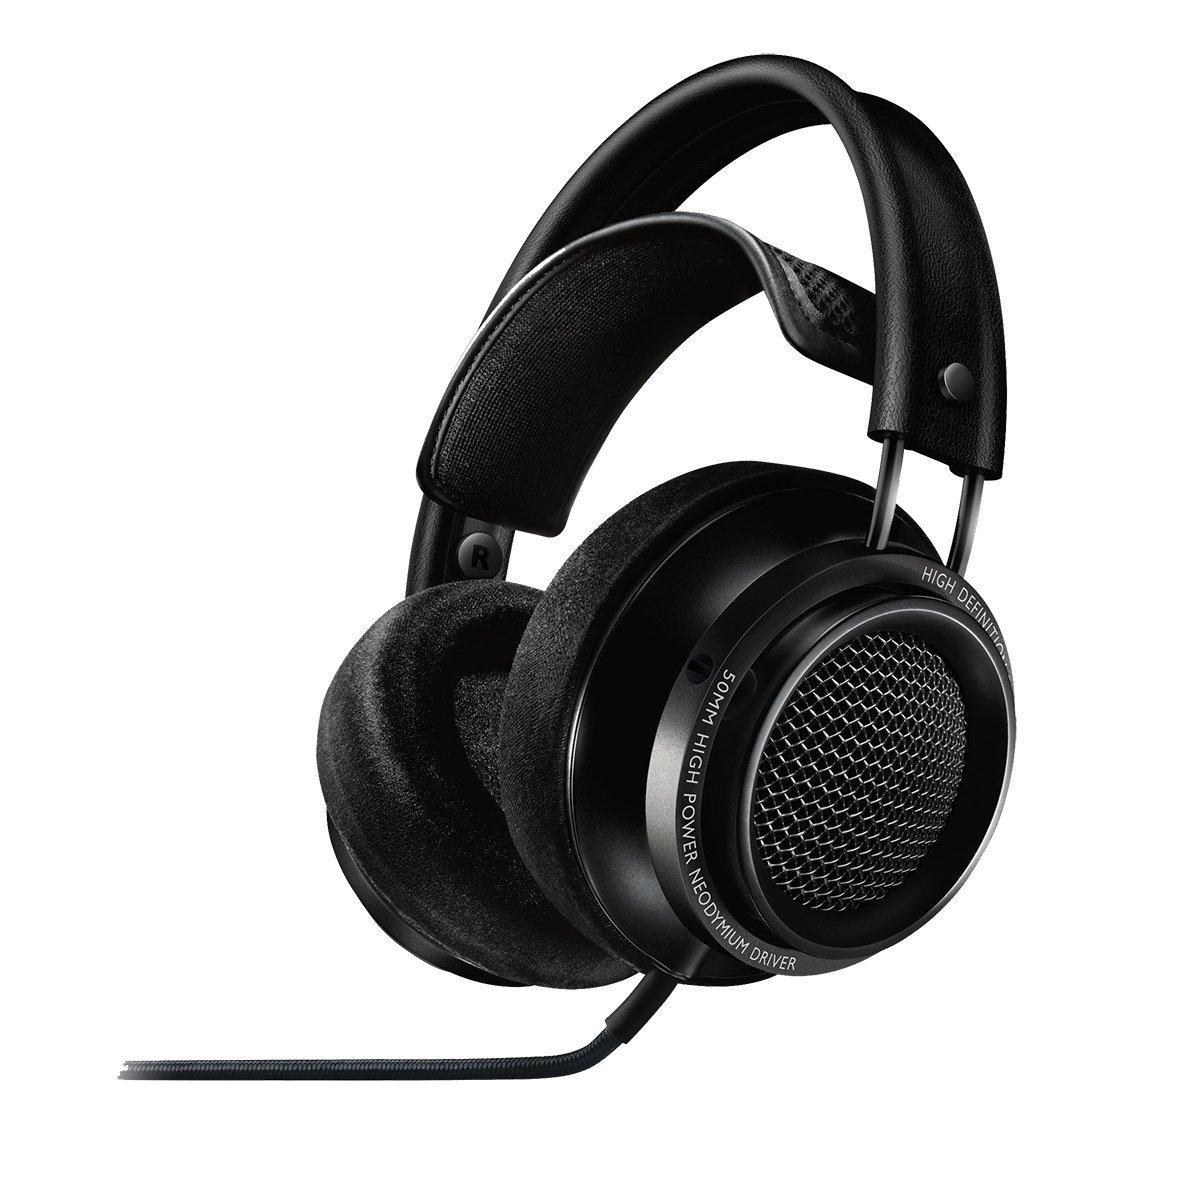 Philips X2/27 Fidelio Premium Headphones, Black for $199.99 at Amazon